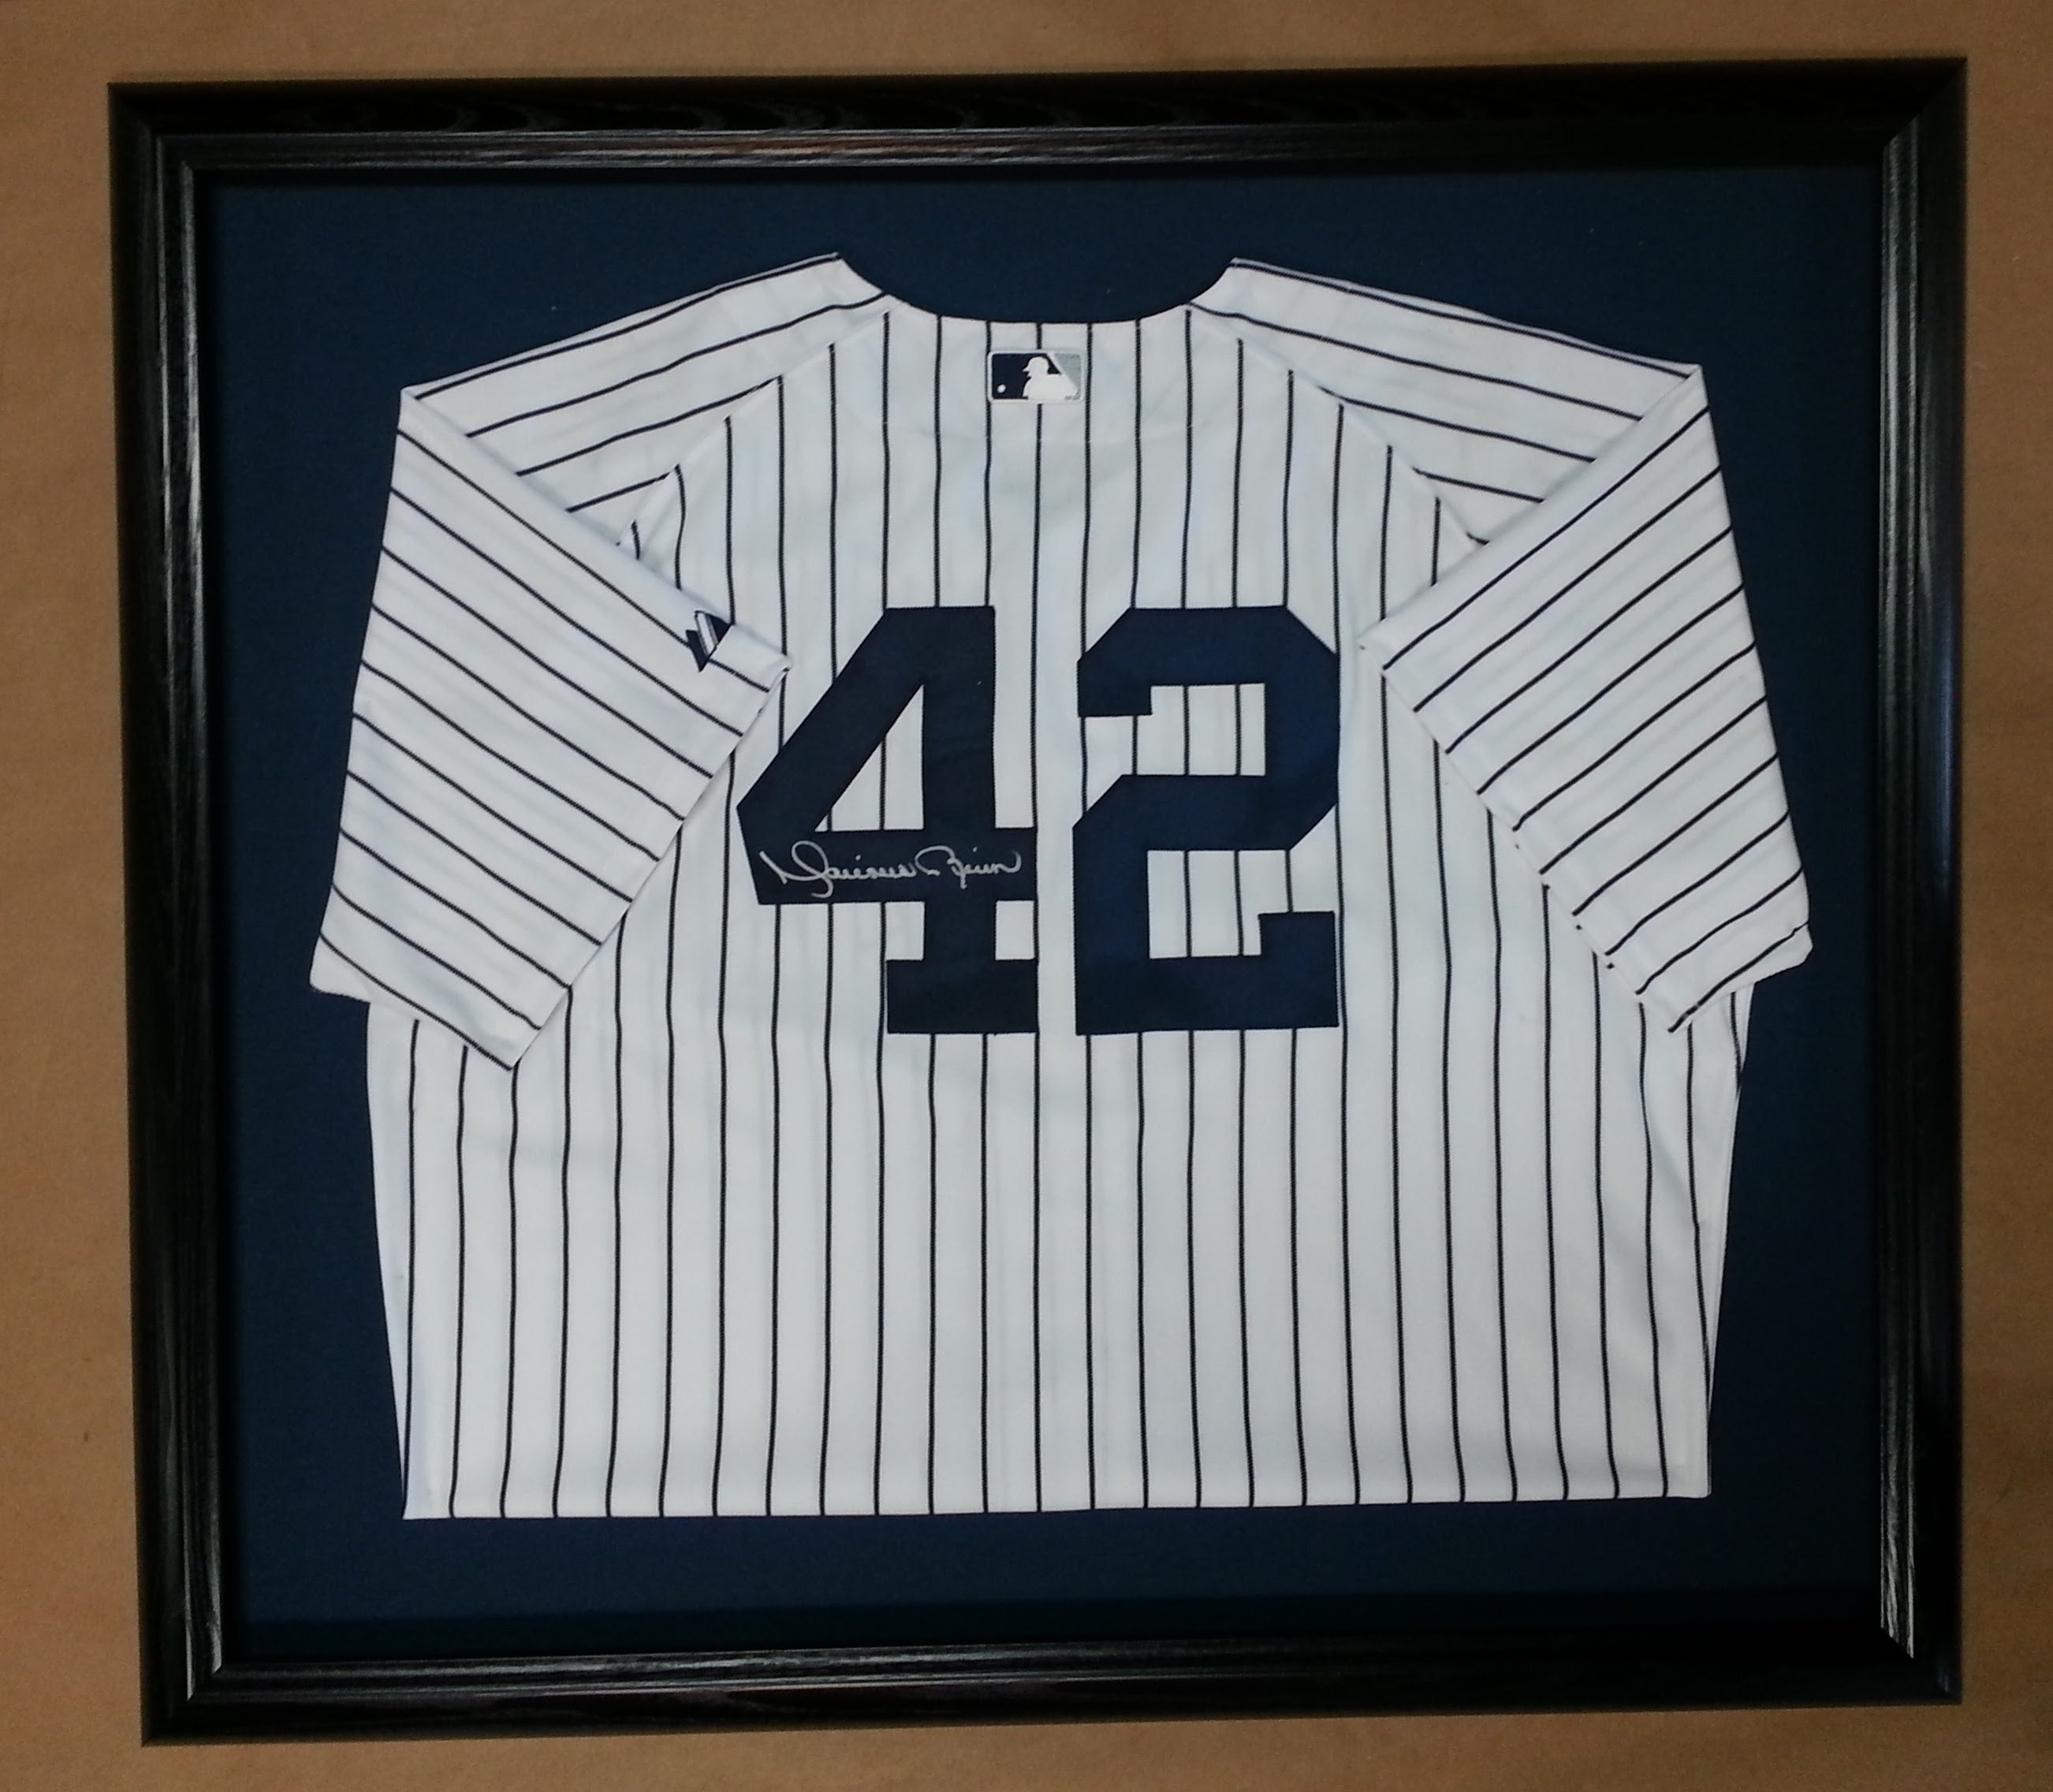 Framed Baseball Jersey Columbia Frame Shop